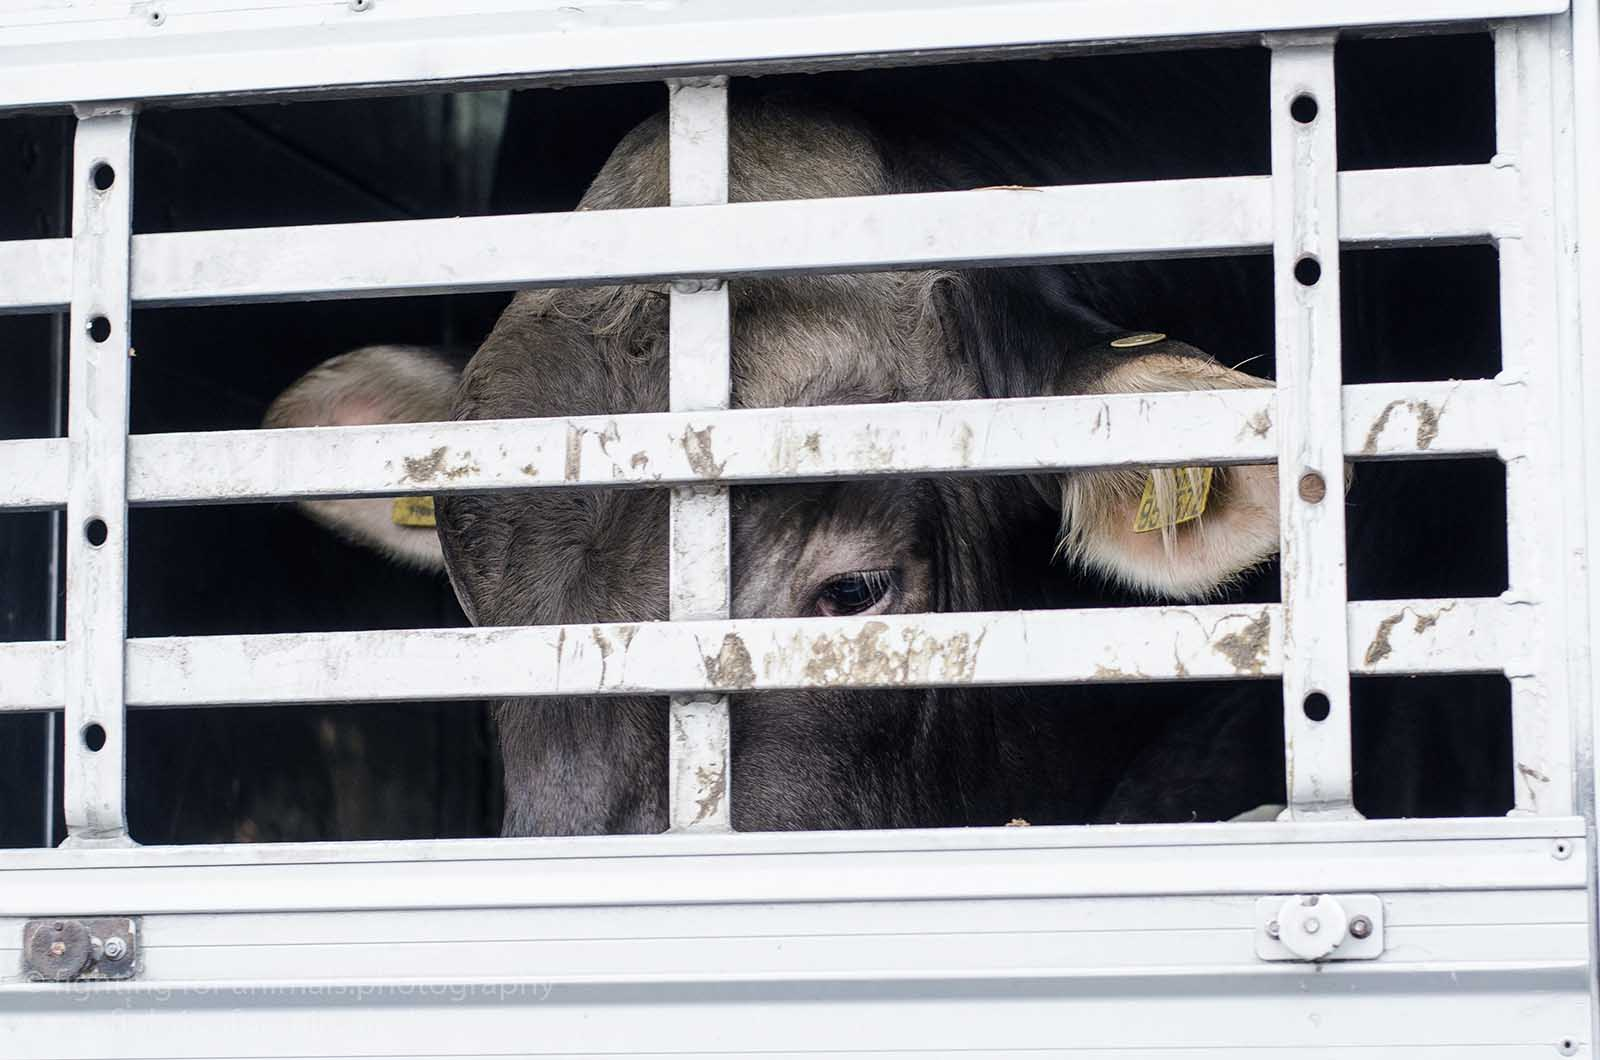 erste veterinaramter stoppen tiertransporte